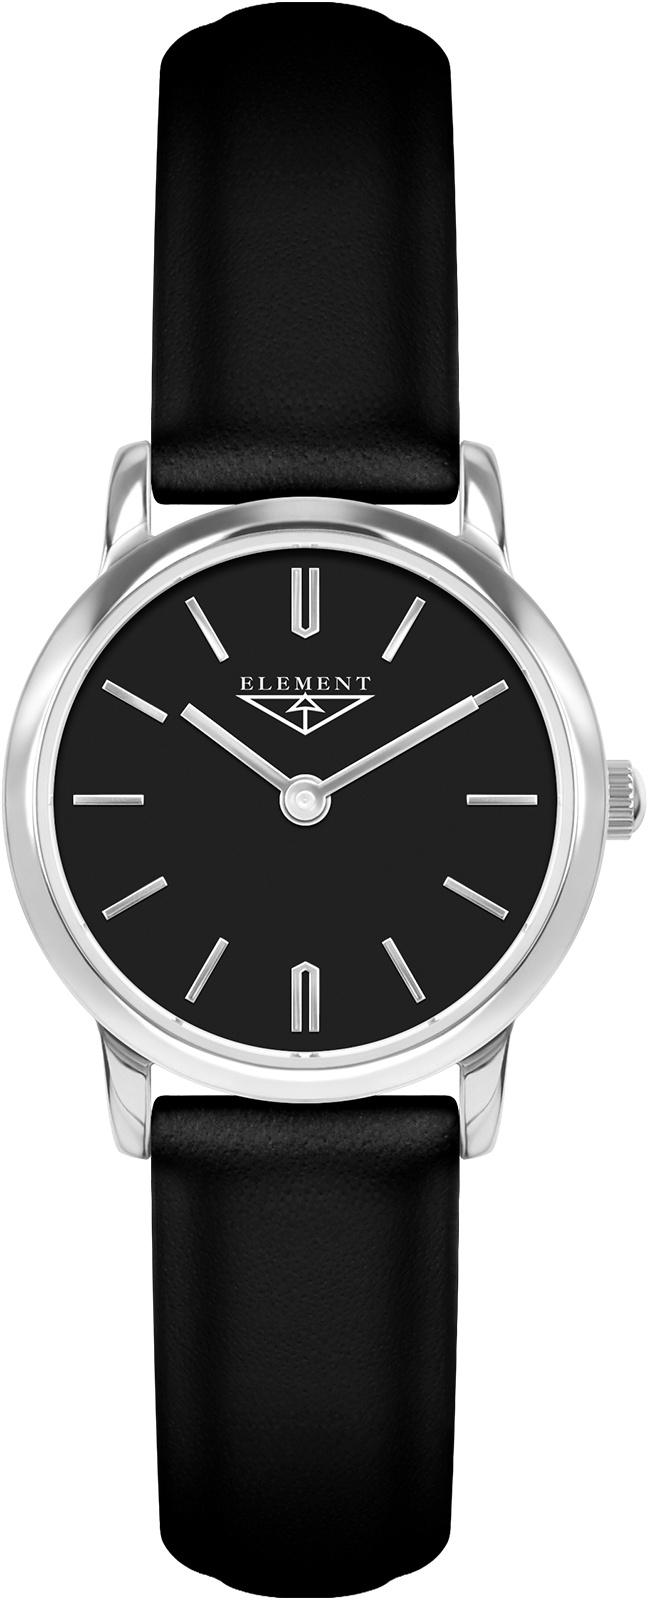 Часы 33 ELEMENT 331309, черный все цены